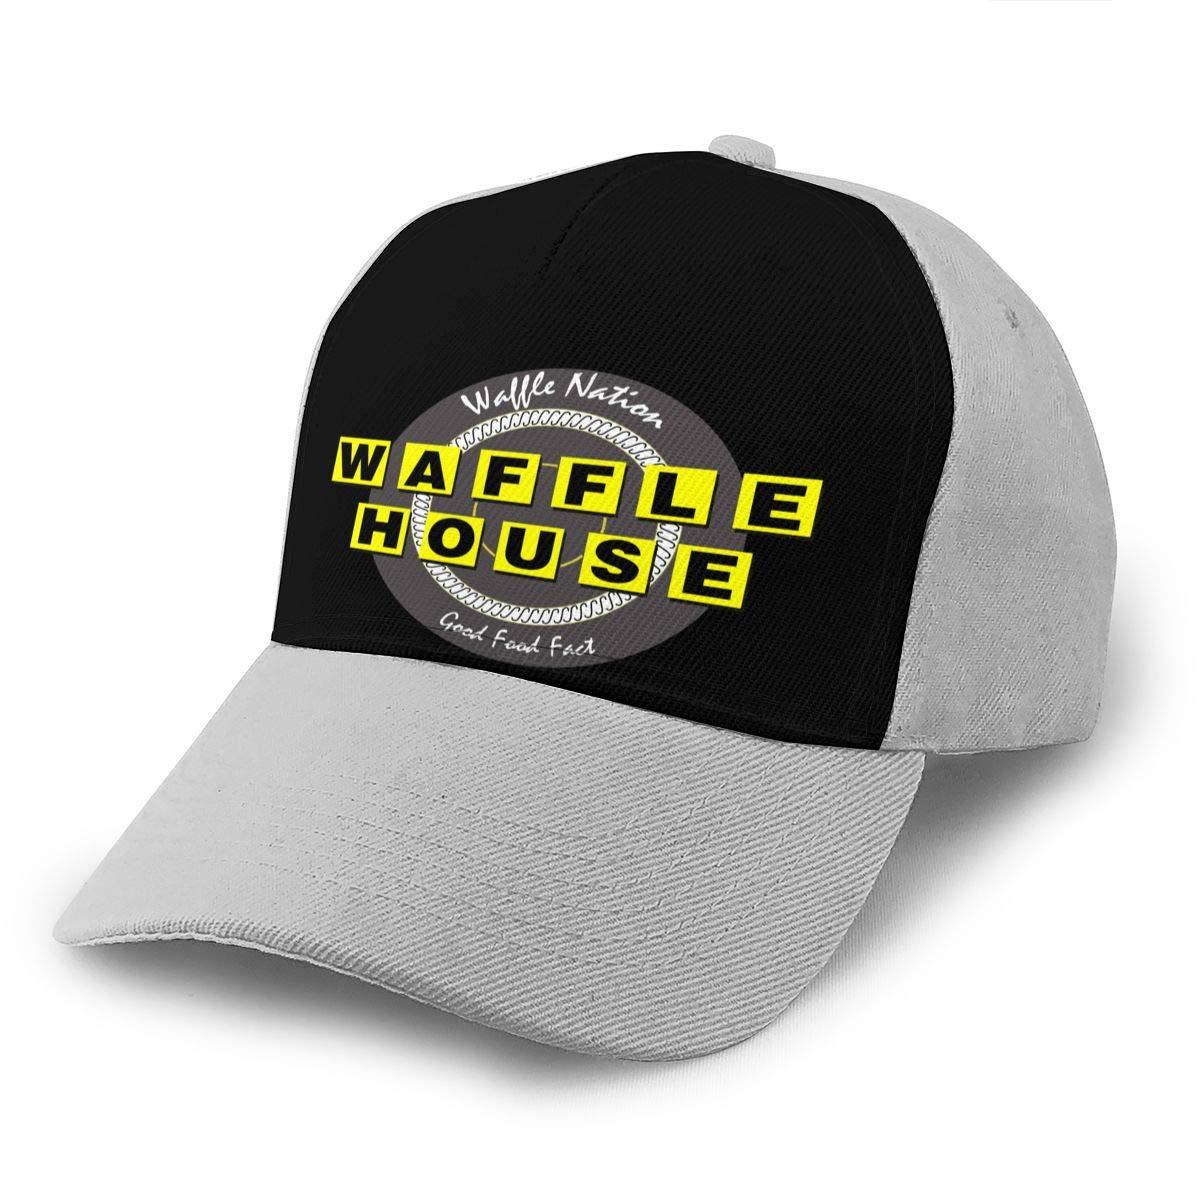 Adjustable Women Men Waffle-House Print Baseball Cap Flat Brim Cap Hats Hip Hop Snapback Sun Hat Boys Girls Gray by Apolonia